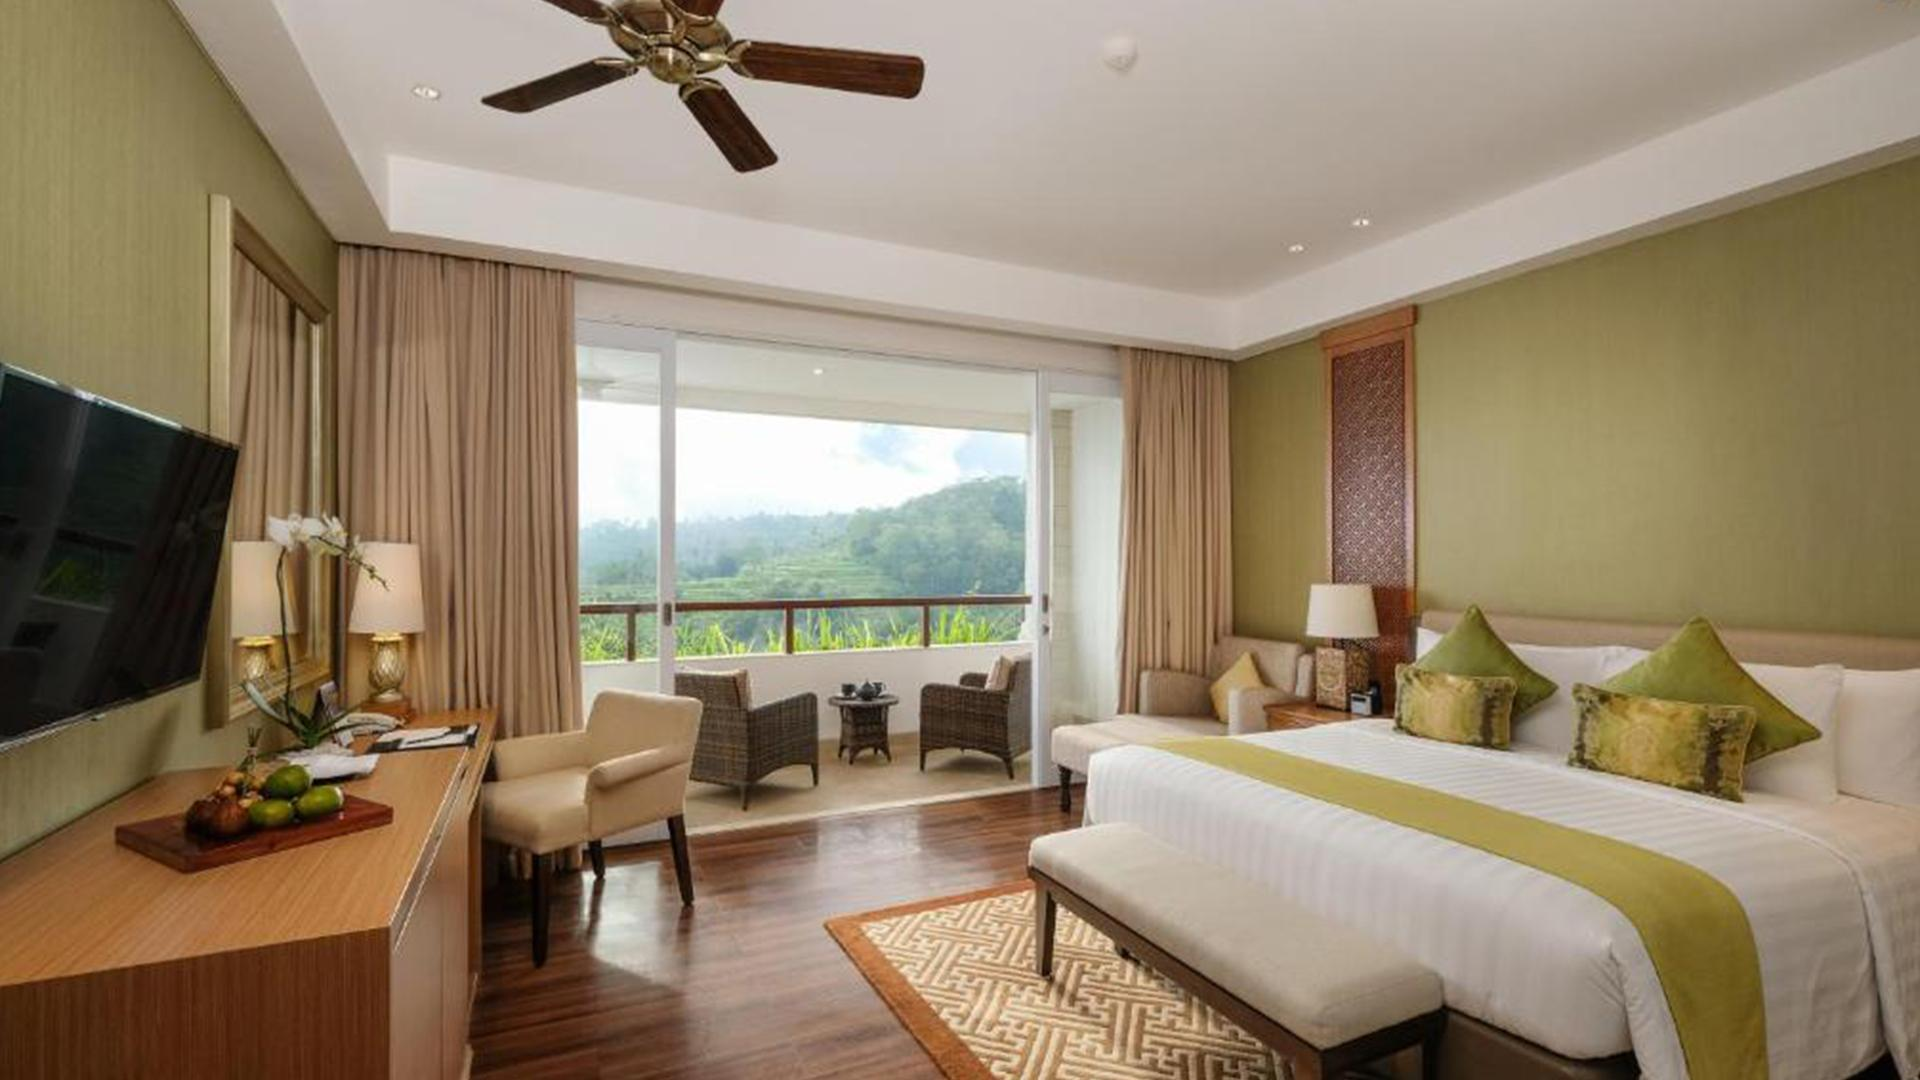 Deluxe Room image 1 at Saranam Resort & Spa by Kabupaten Tabanan, Bali, Indonesia